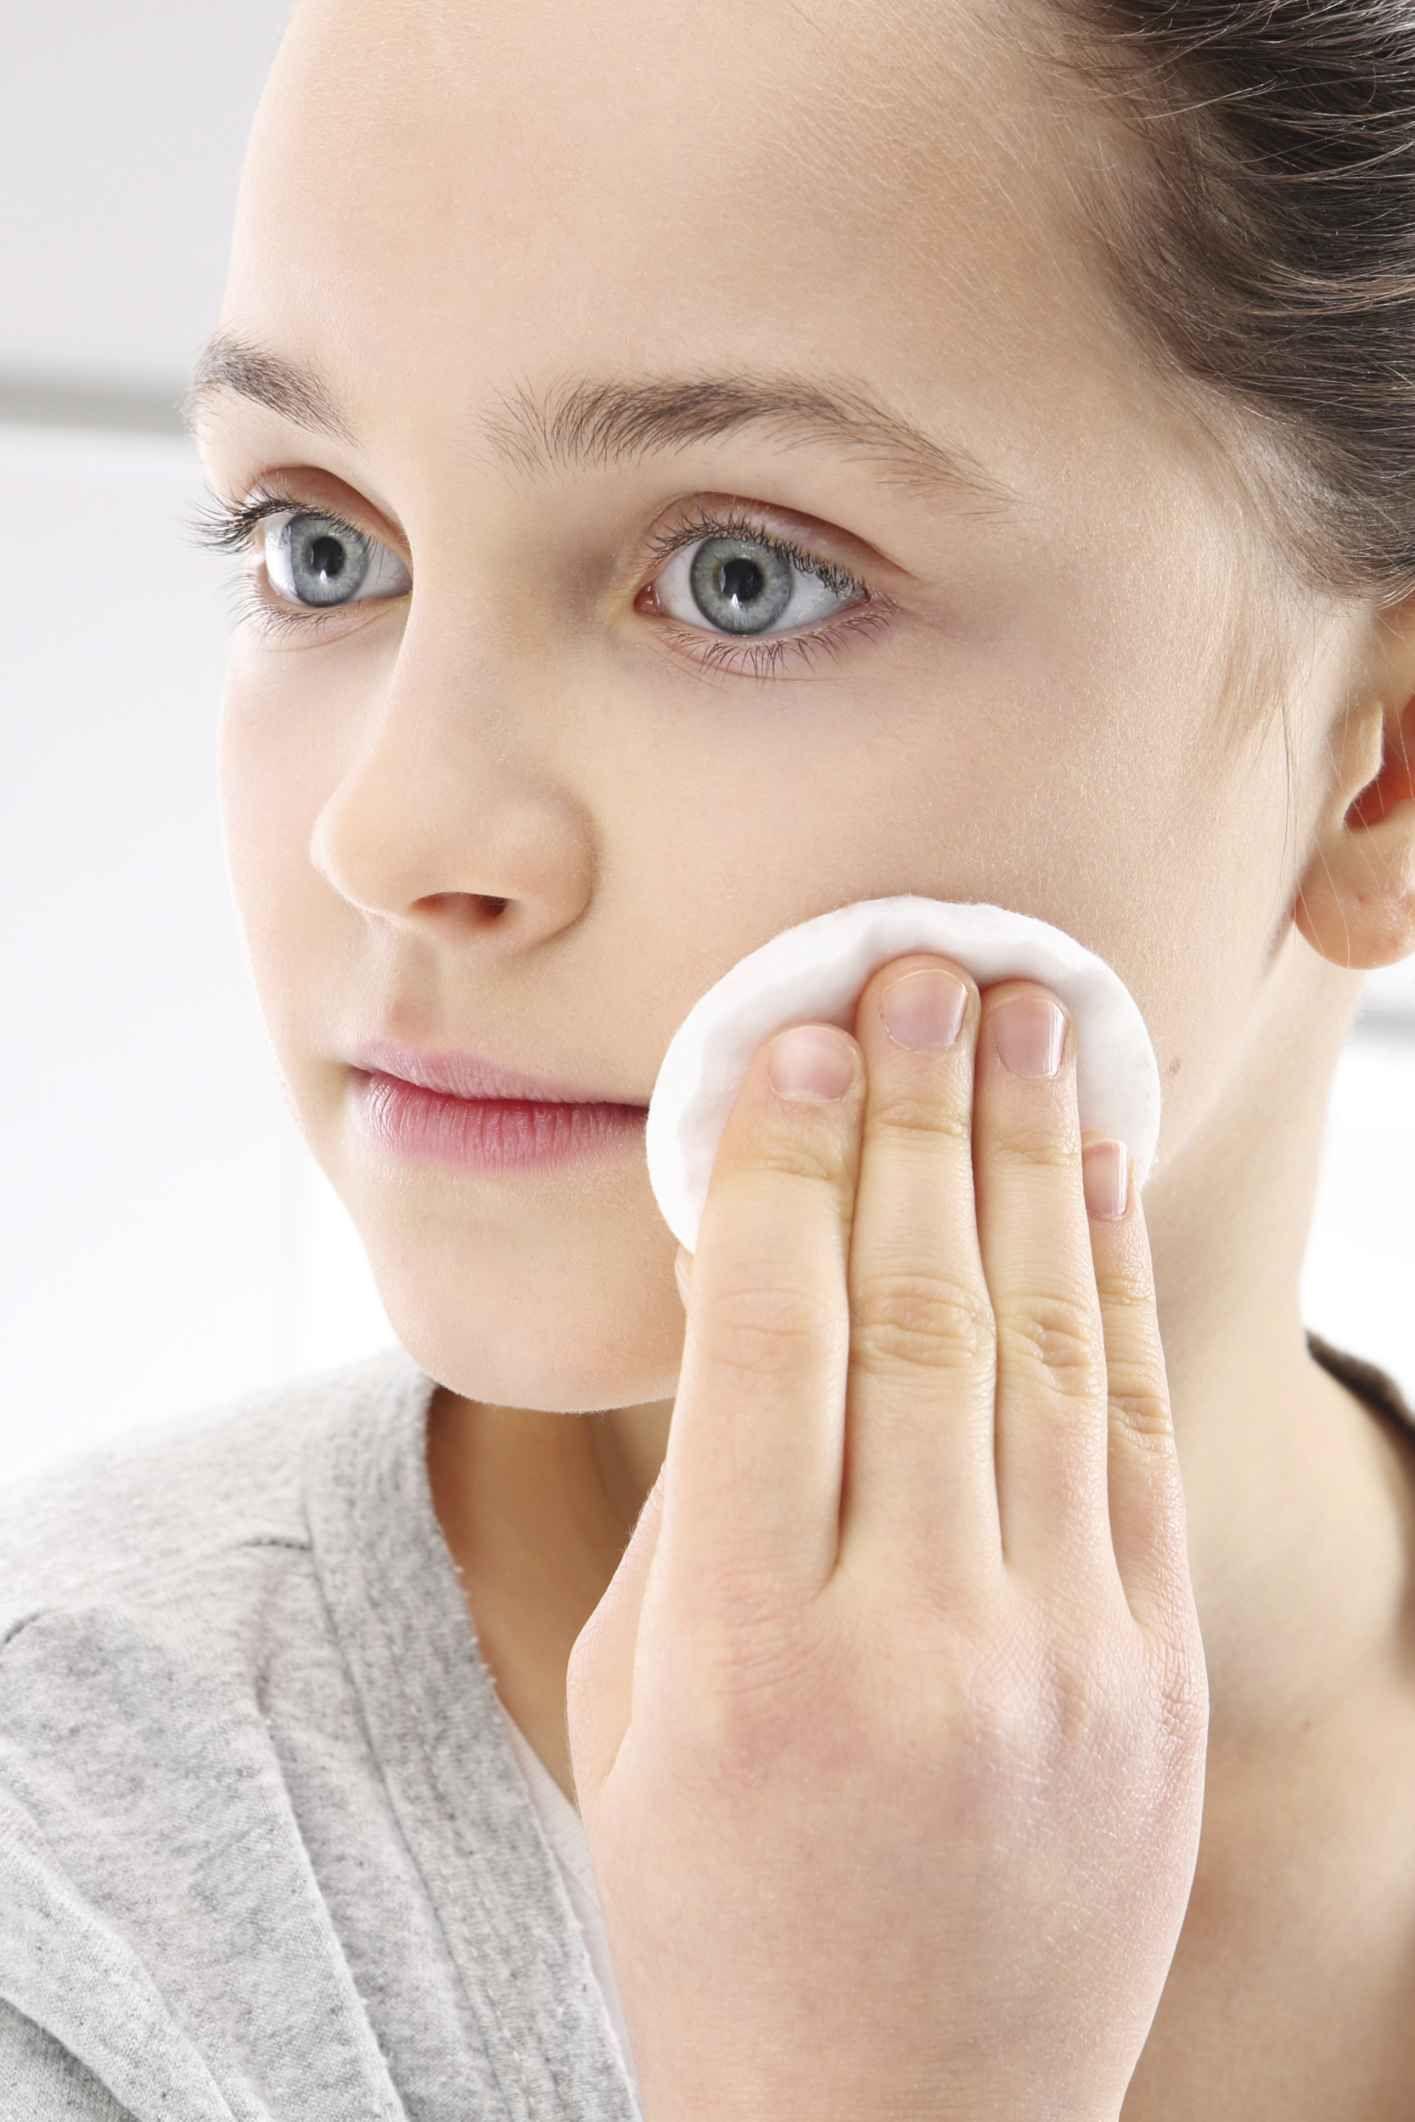 fashionstylepersonalcare skincare acneproblemskin